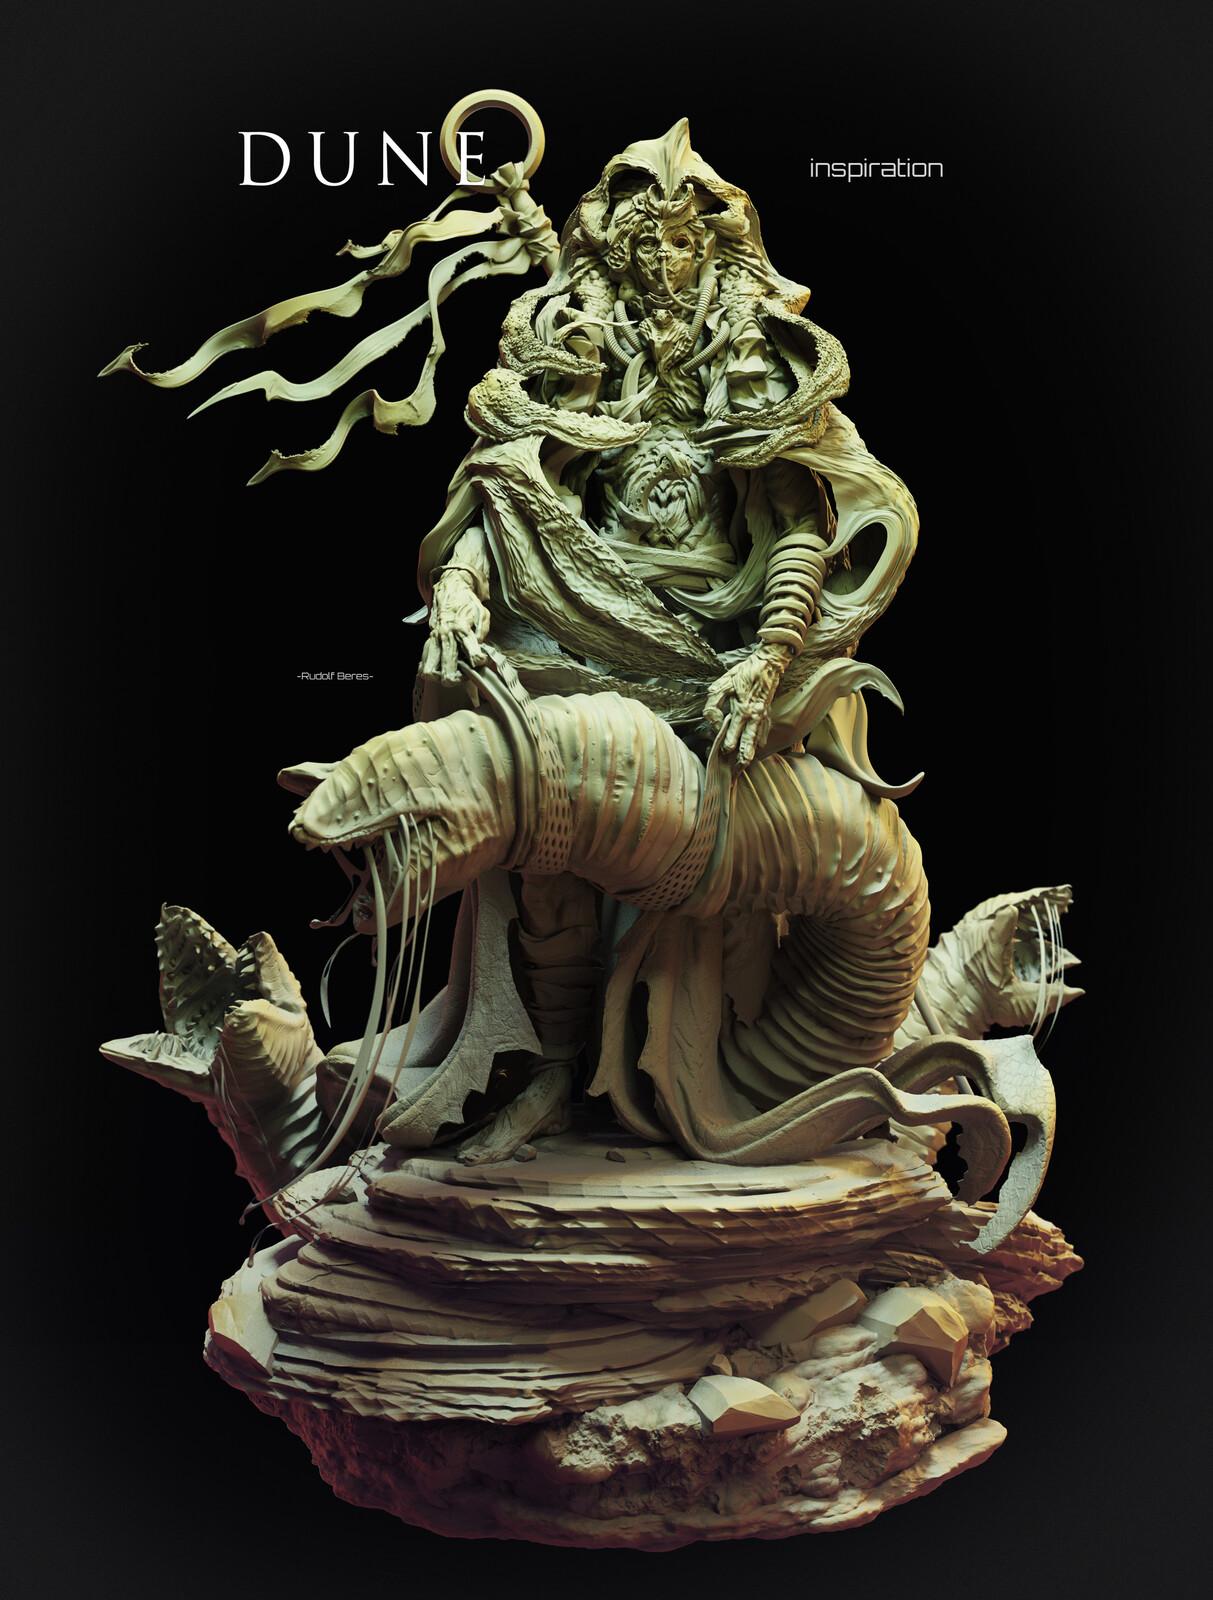 DUNE_Inspiration Fremen Monk_Worm Master